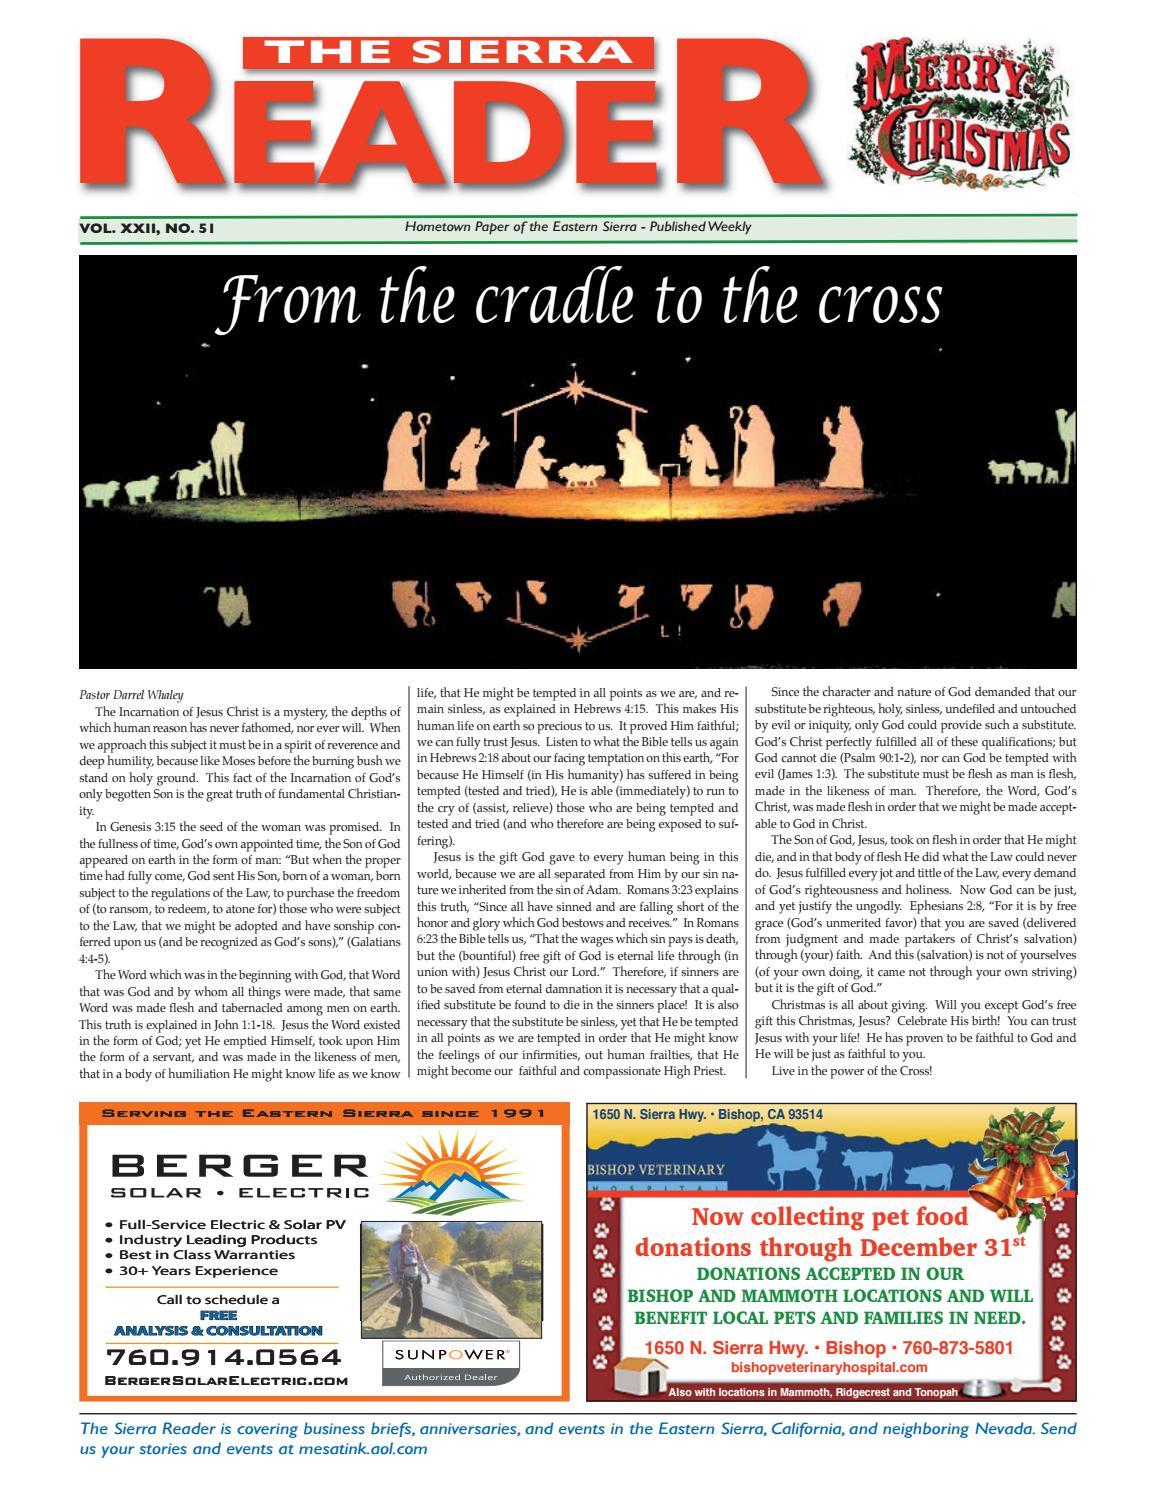 the sierra reader december 21 by The Sierra Reader - issuu